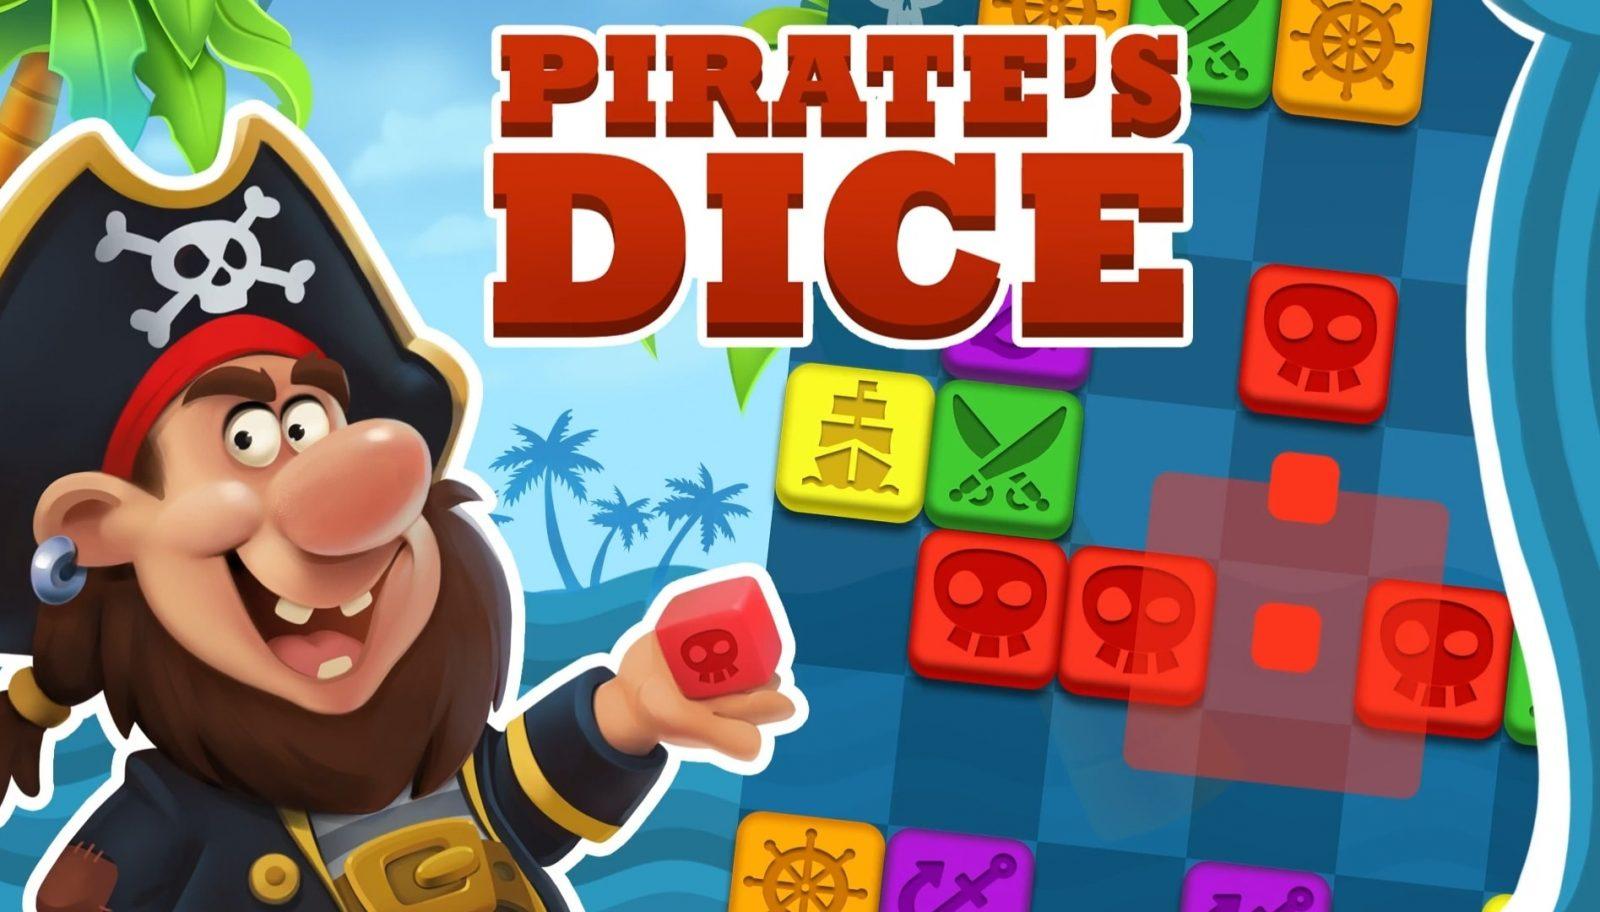 Pirate's Dice